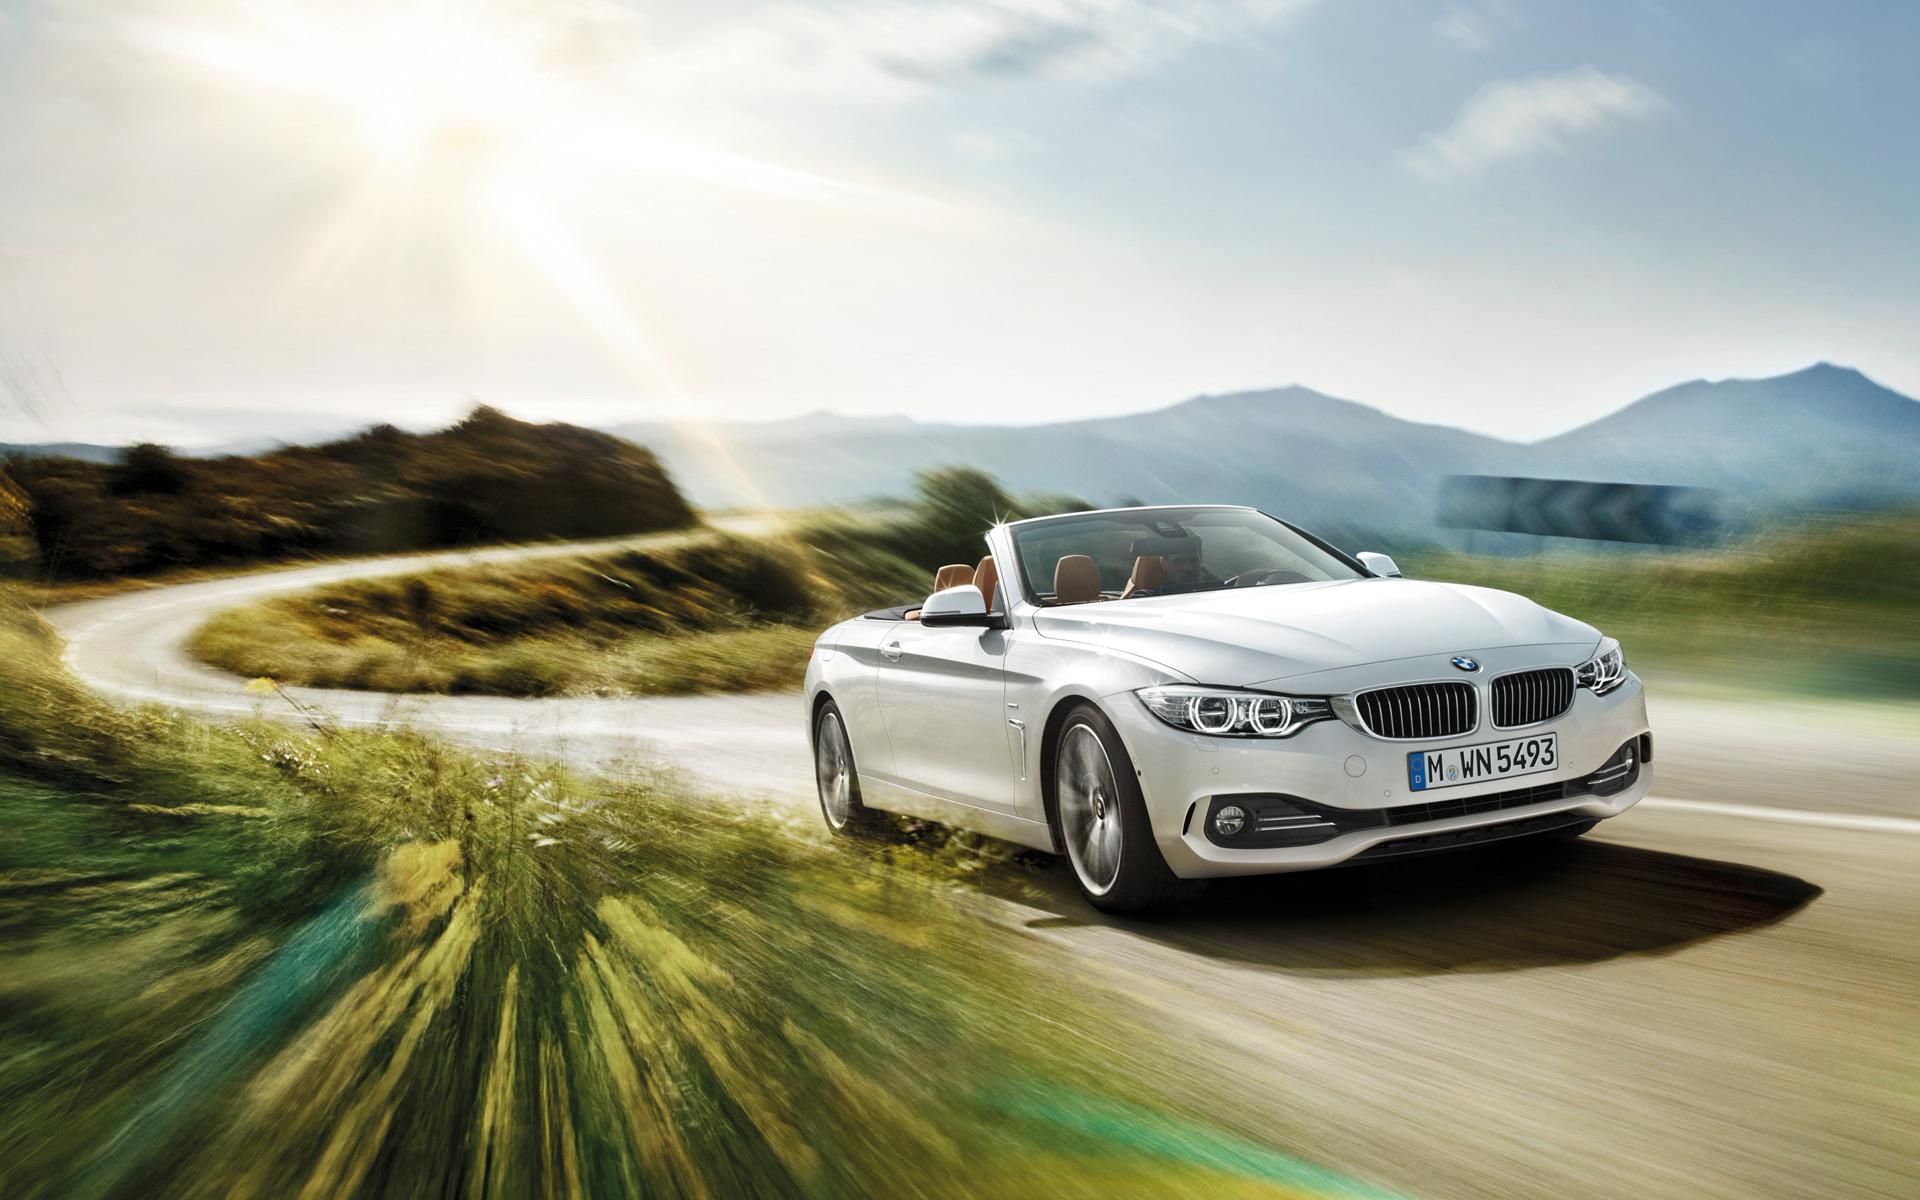 BMW 4series convertible wallpaper 1900x1200 08